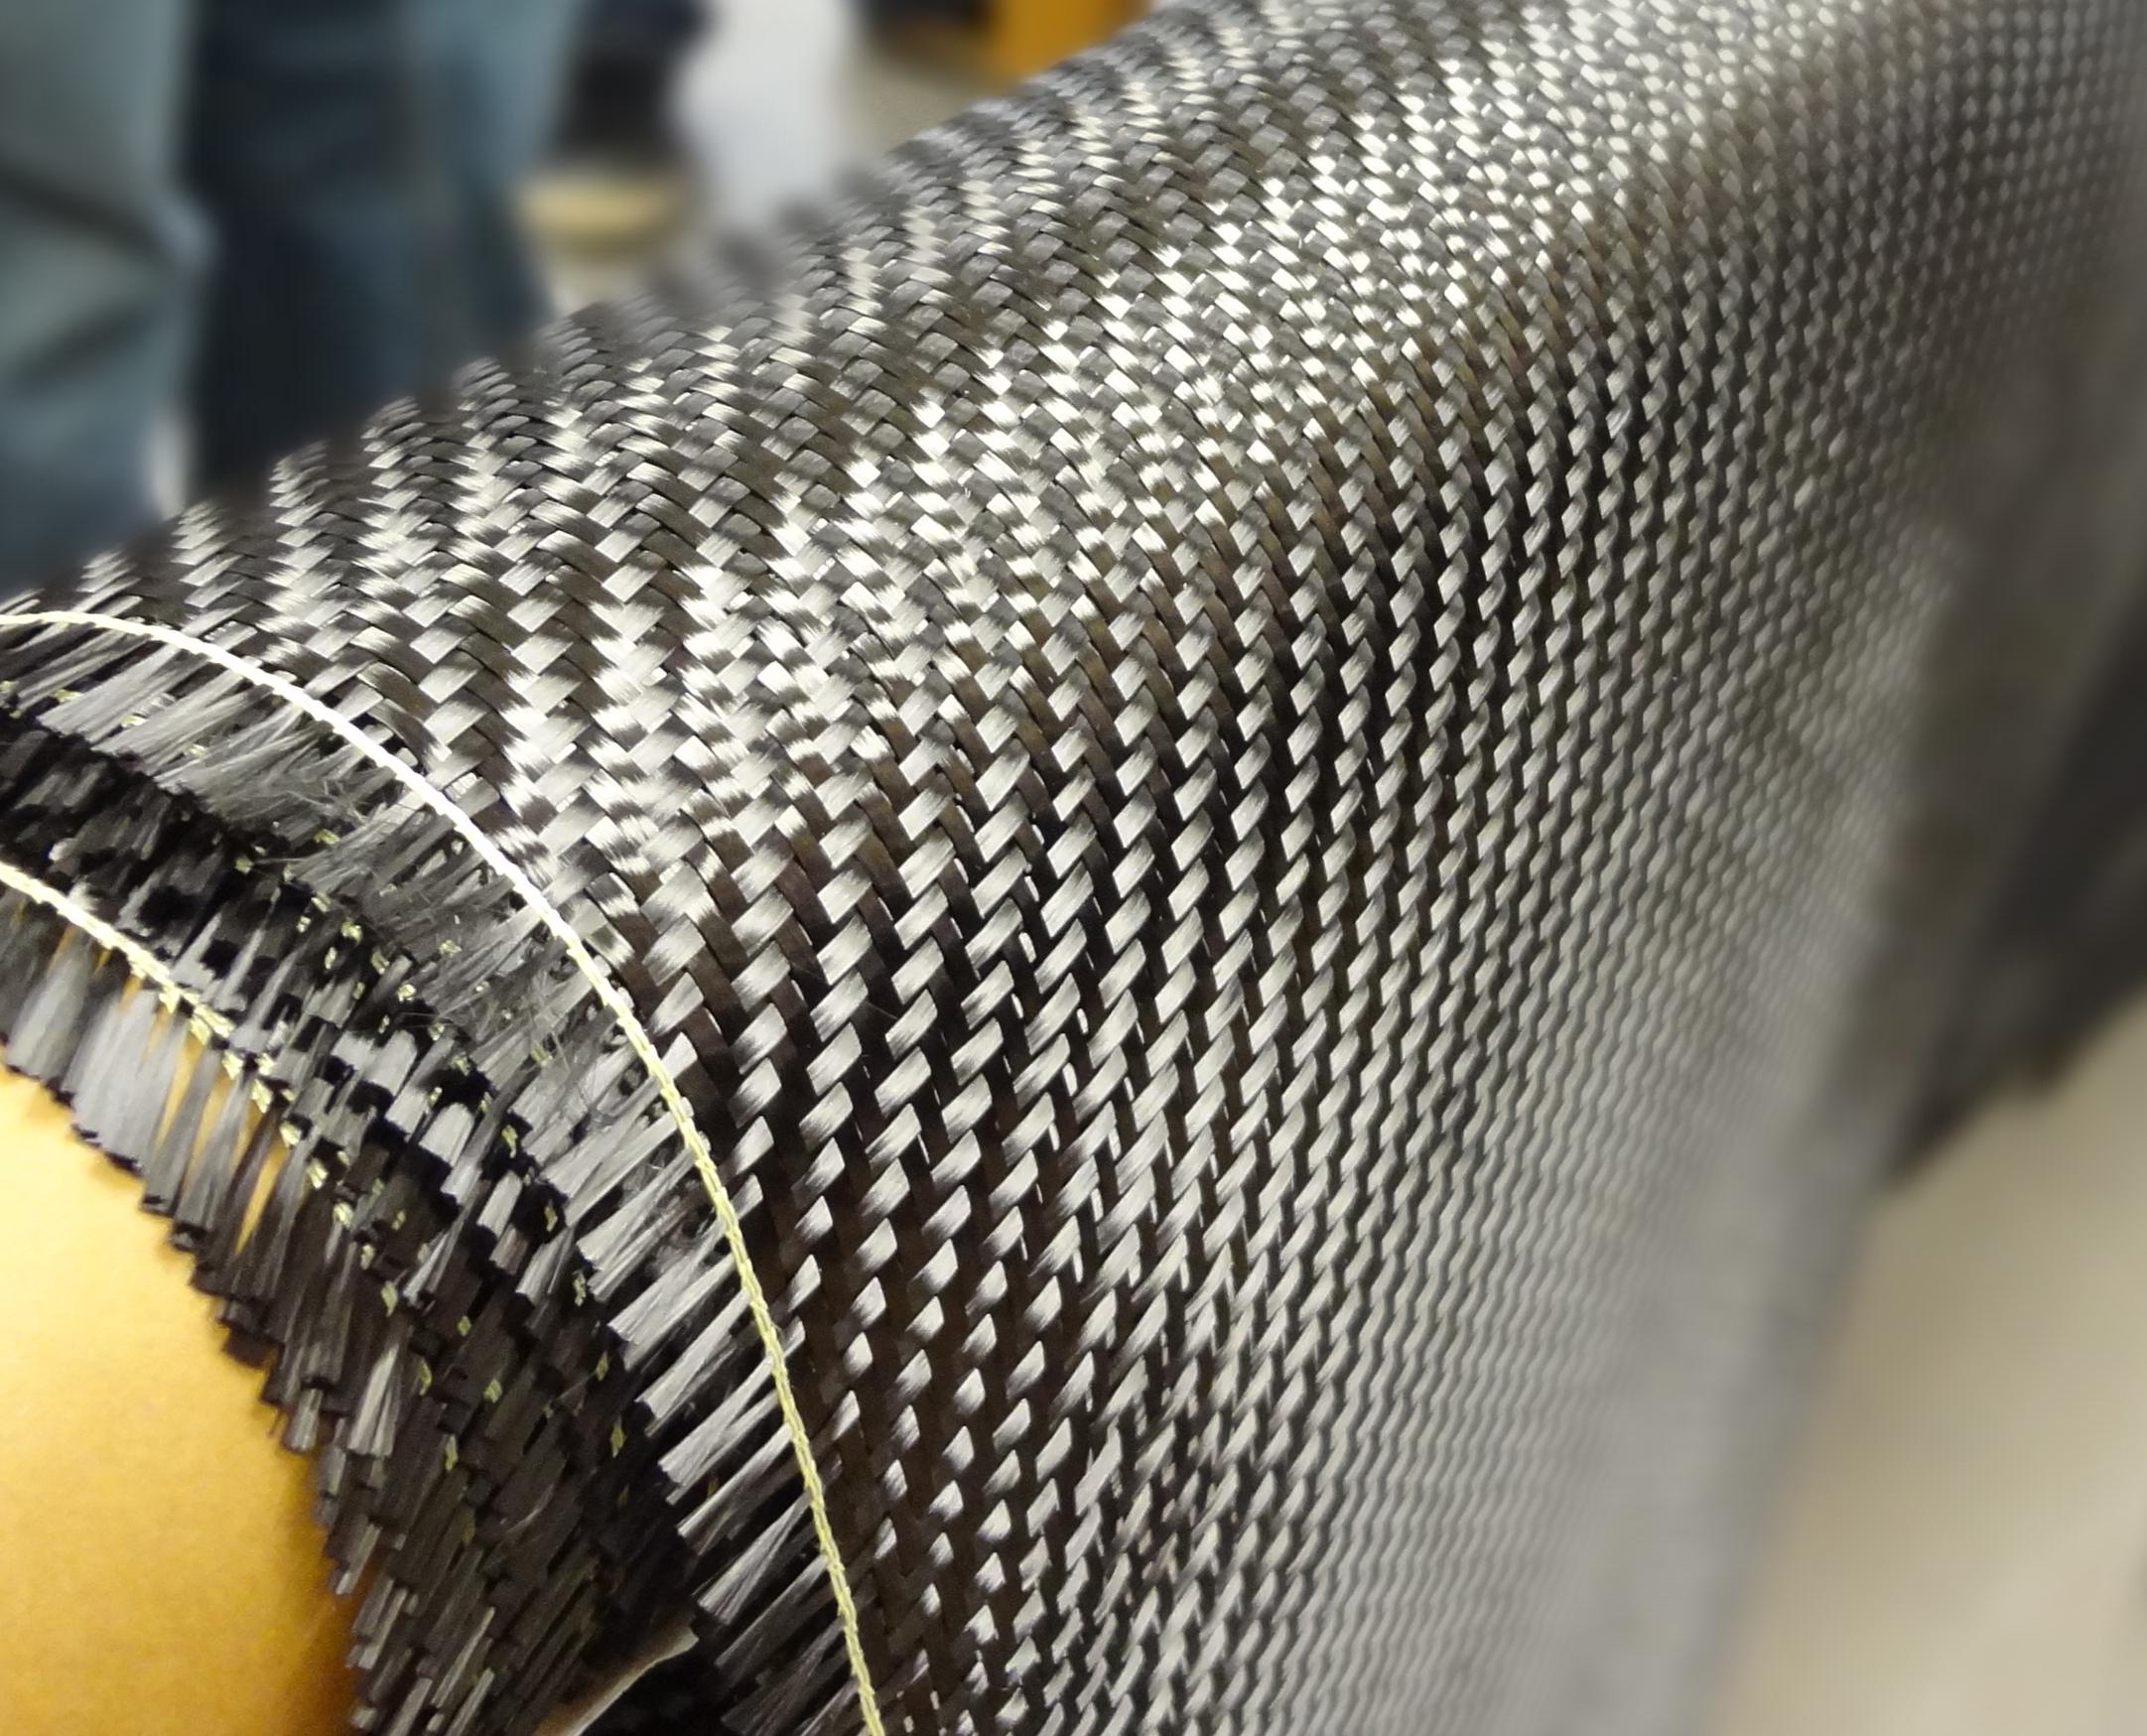 Carbonfaser-Bauteile von Faurecia